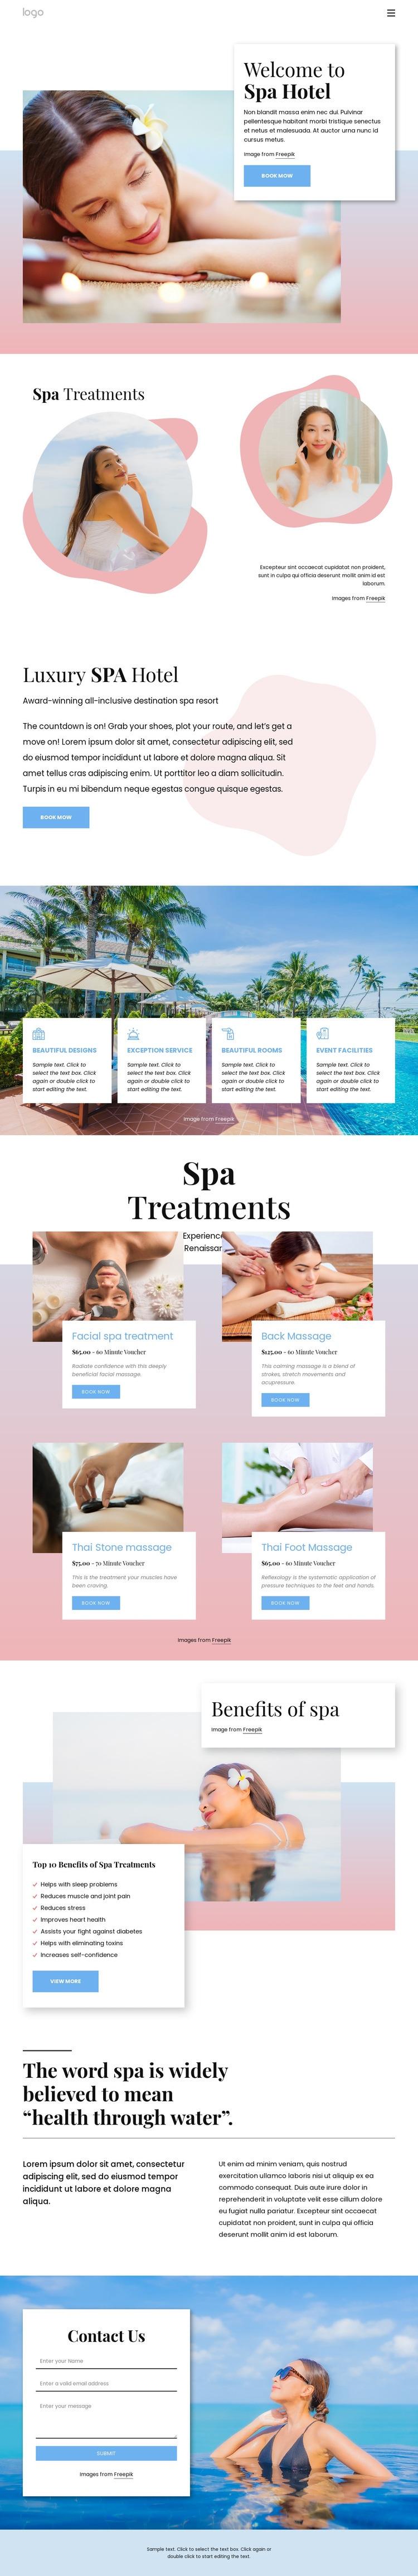 Spa boutique hotel Web Page Designer